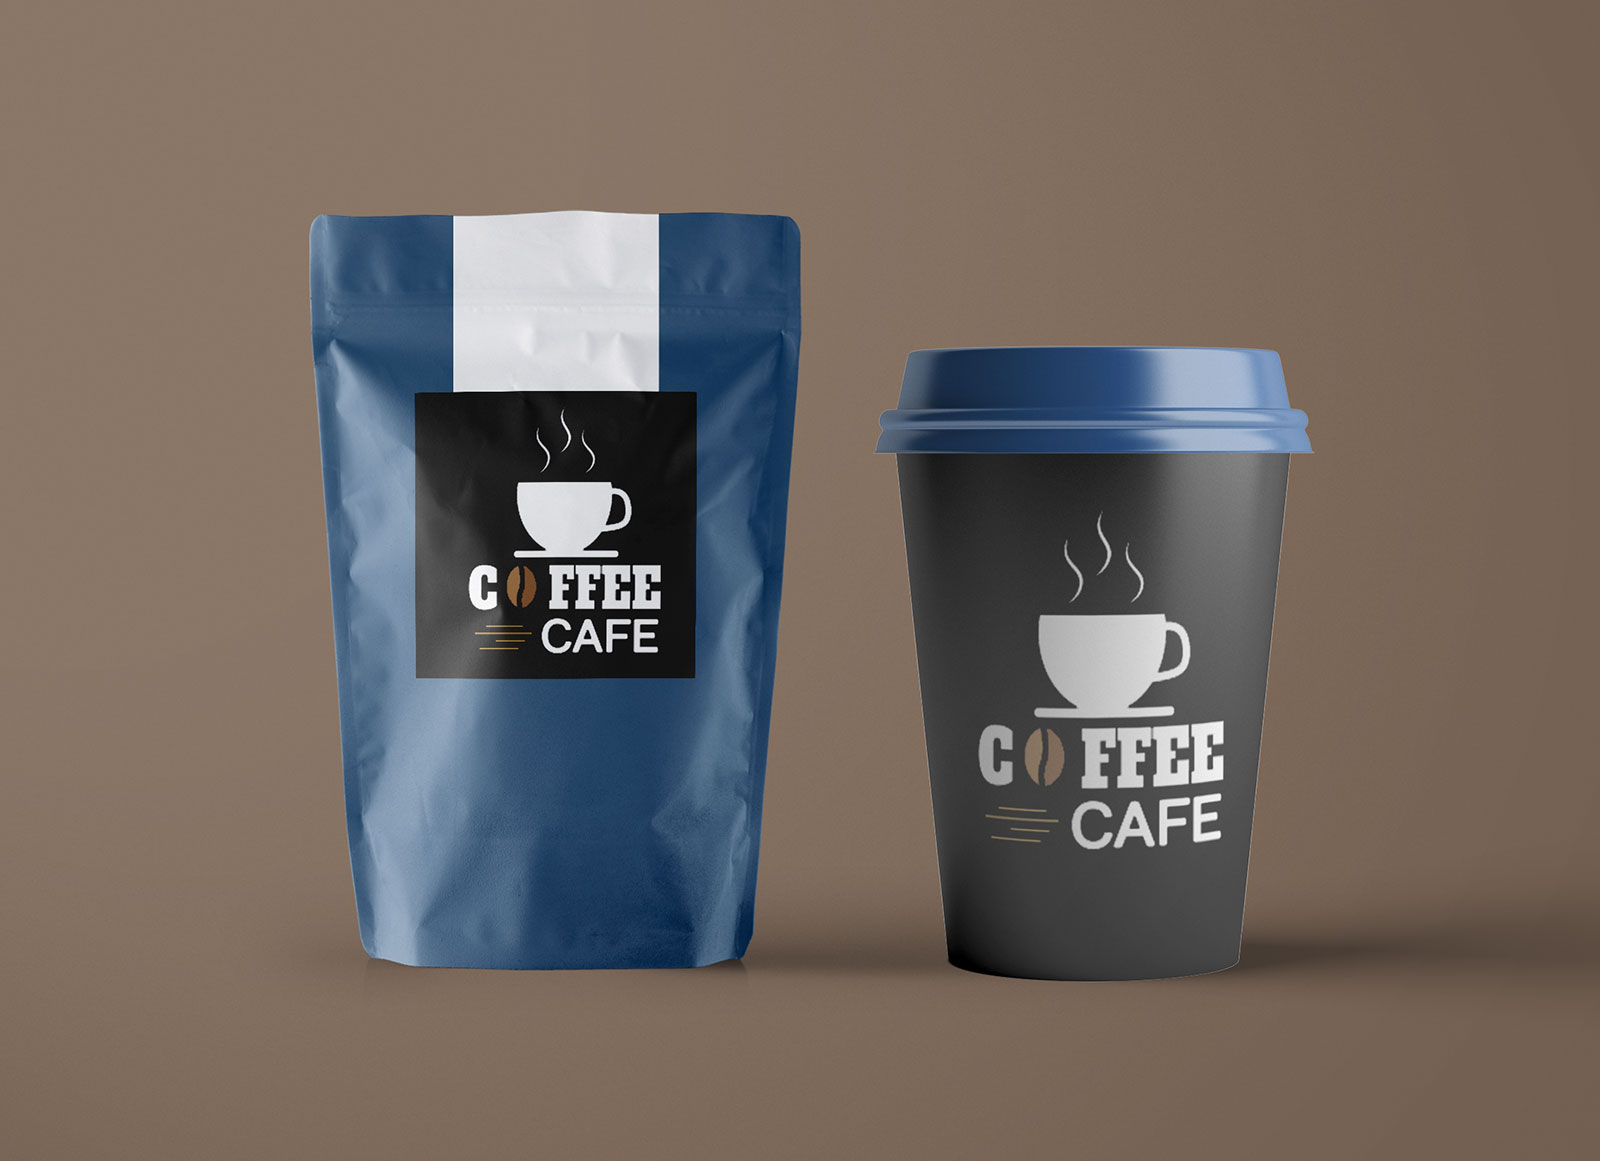 Free Paper Coffee Bag & Cup Packaging Mockup PSD